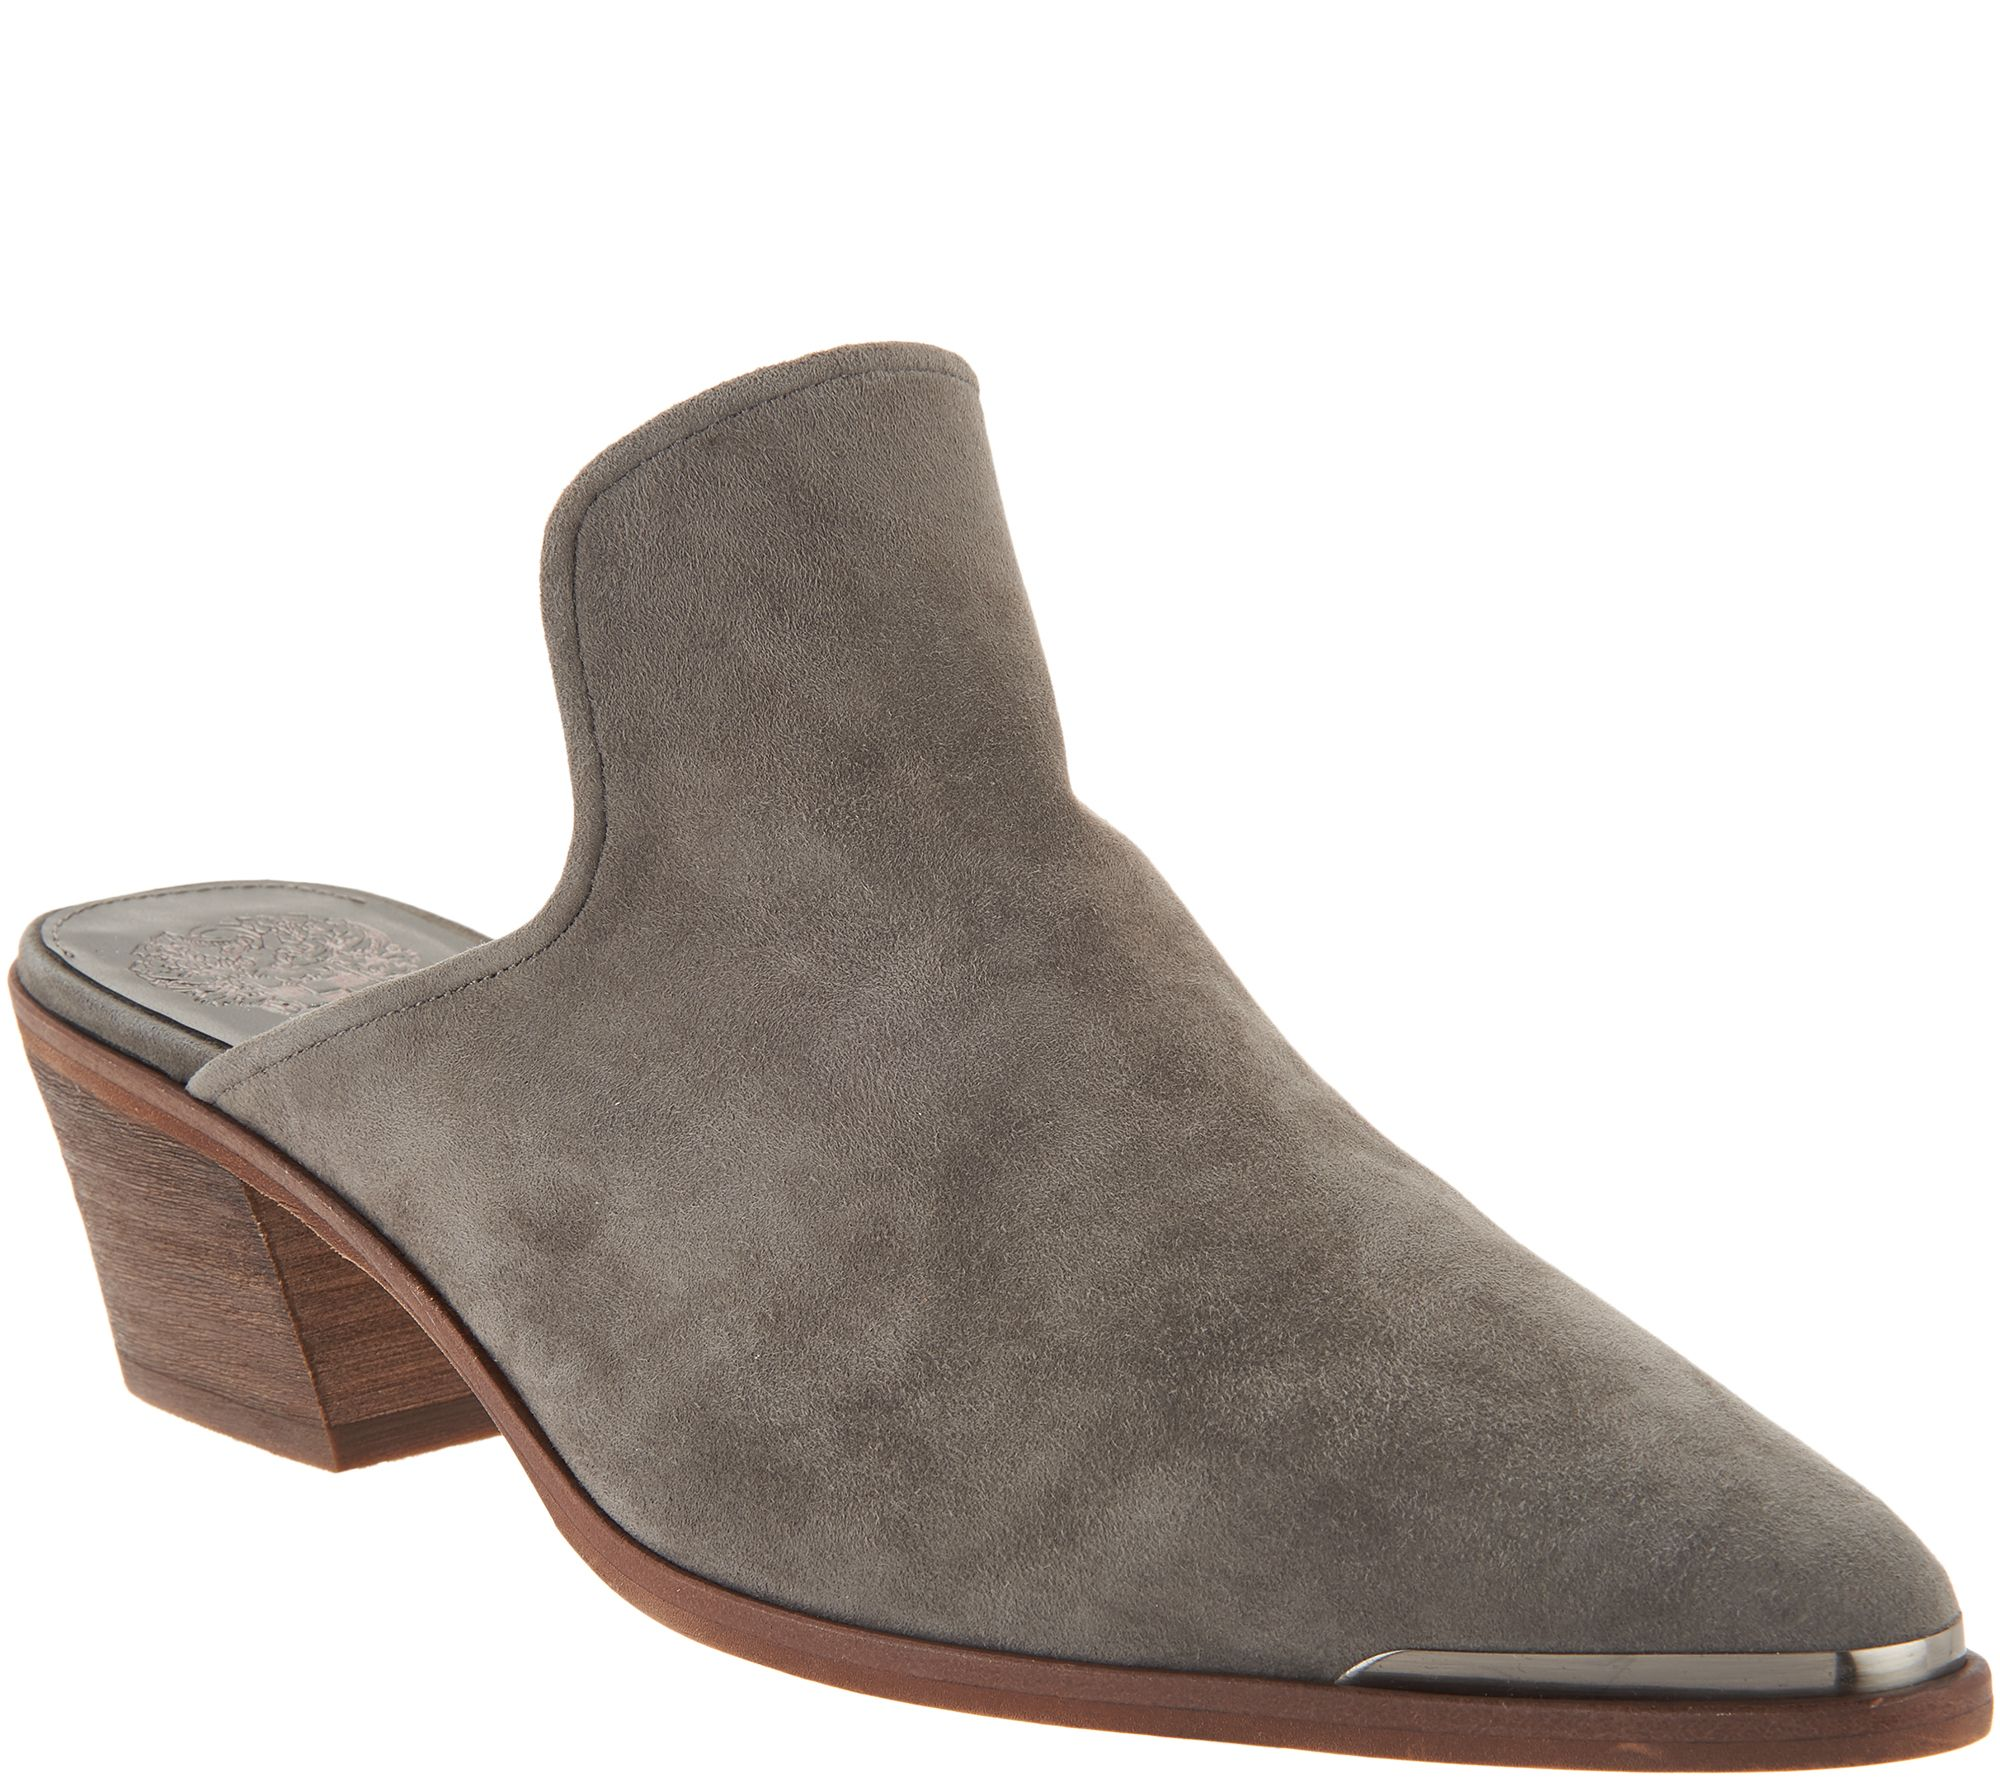 6d124ff8e0d4 Vince Camuto Leather Slip-on Mules - Karcha - Page 1 — QVC.com